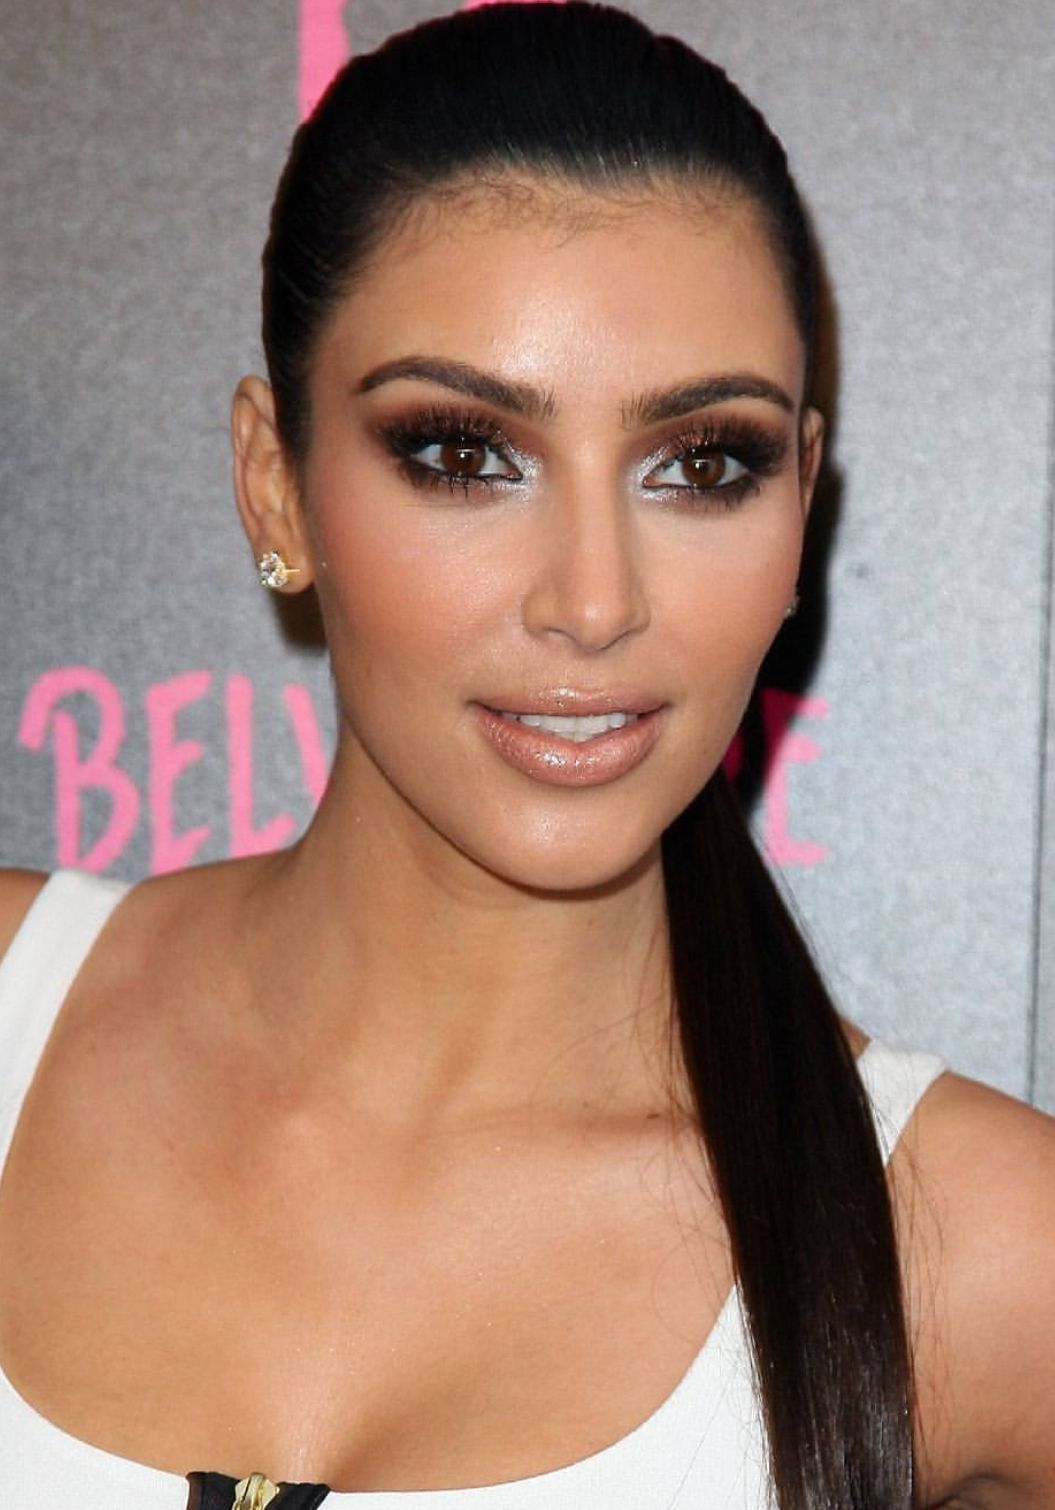 Kim Kardashian smokey eyeshadow brown and blue makeup look ...